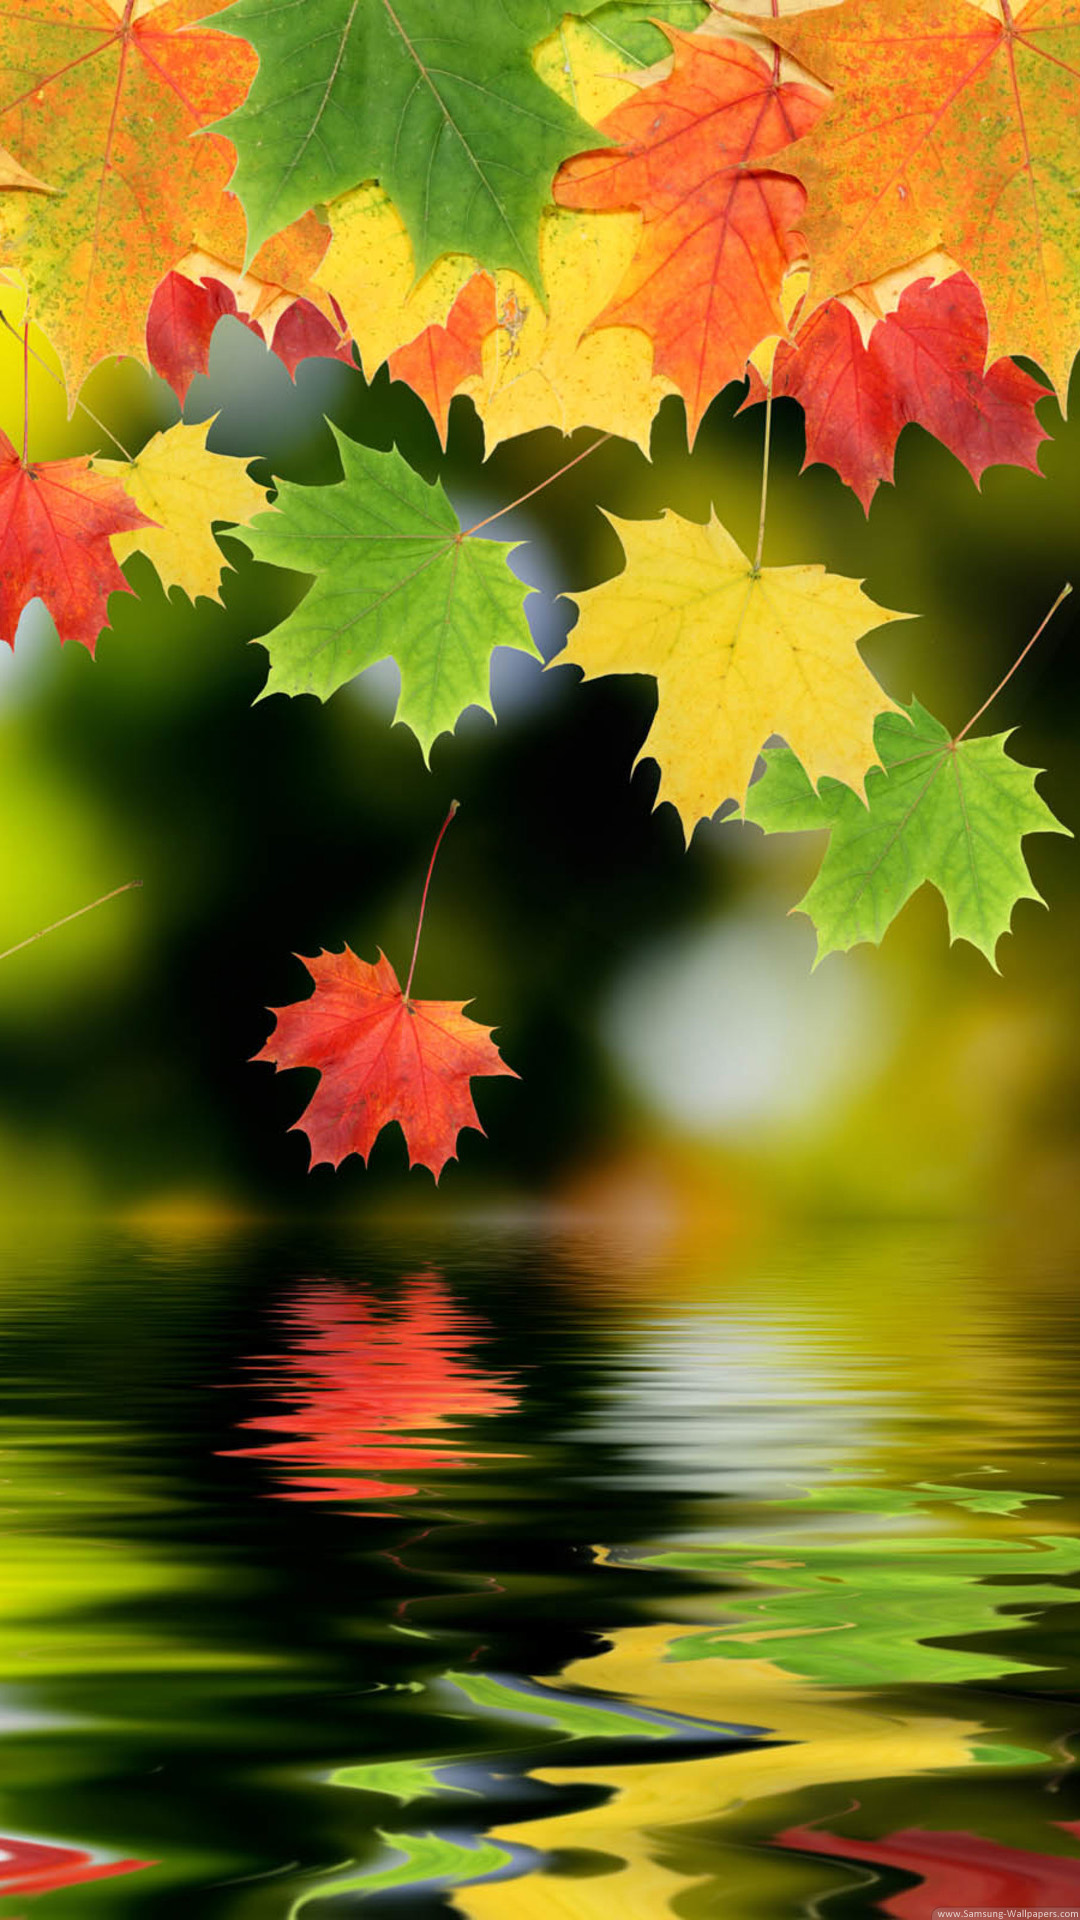 Autumn Maple Leafs iPhone 6 Plus HD Wallpaper iPod Wallpaper 1080x1920